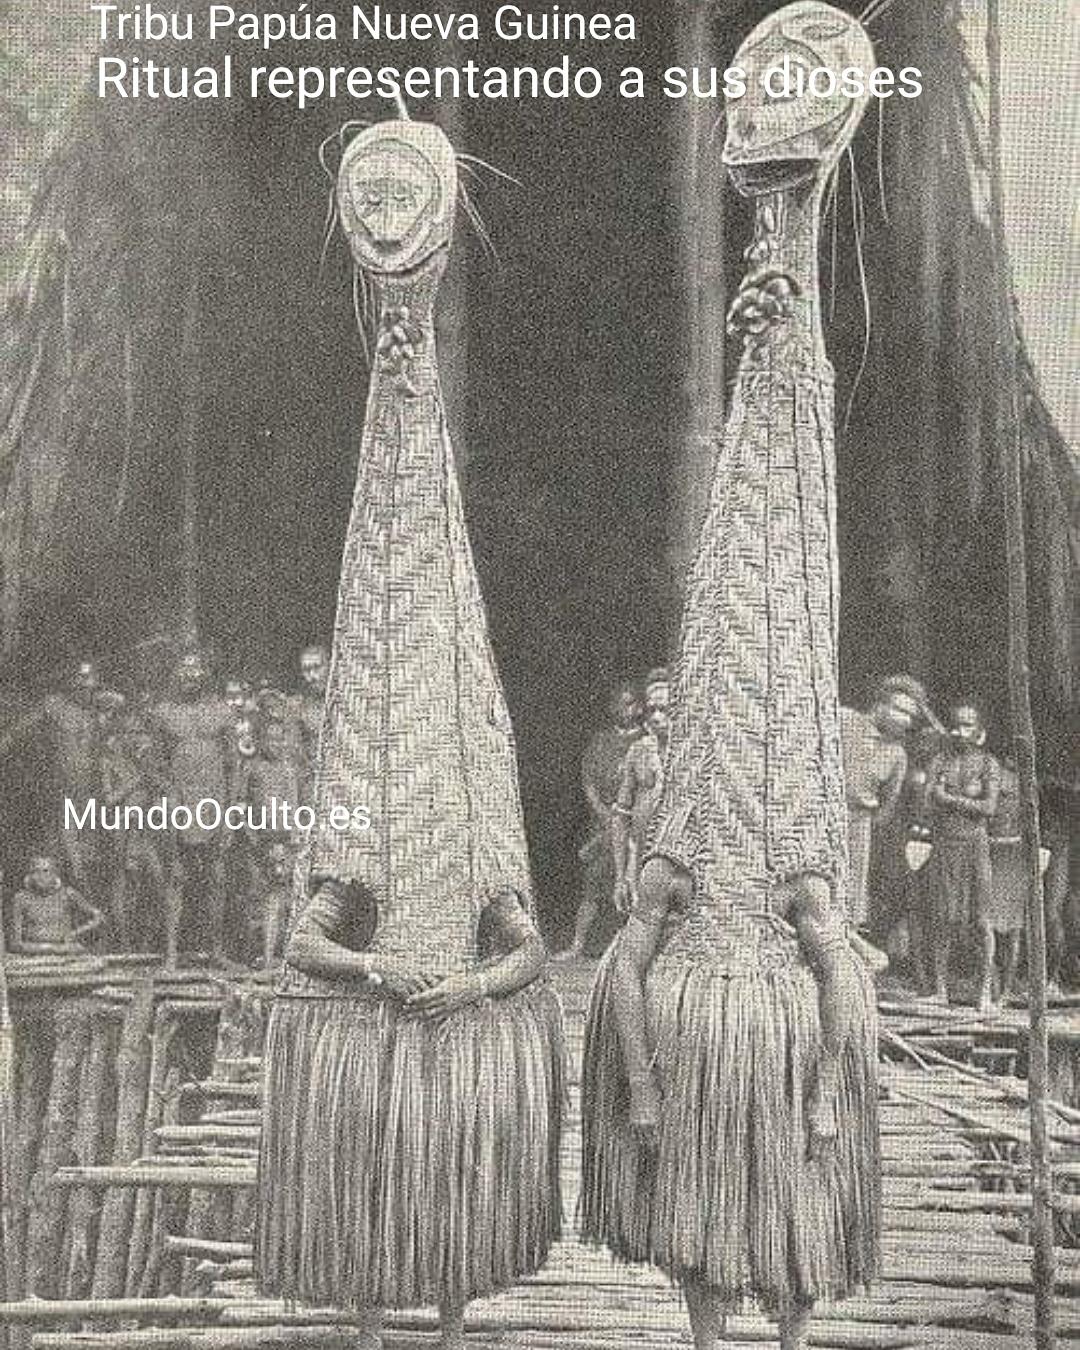 Tribu representando a sus dioses